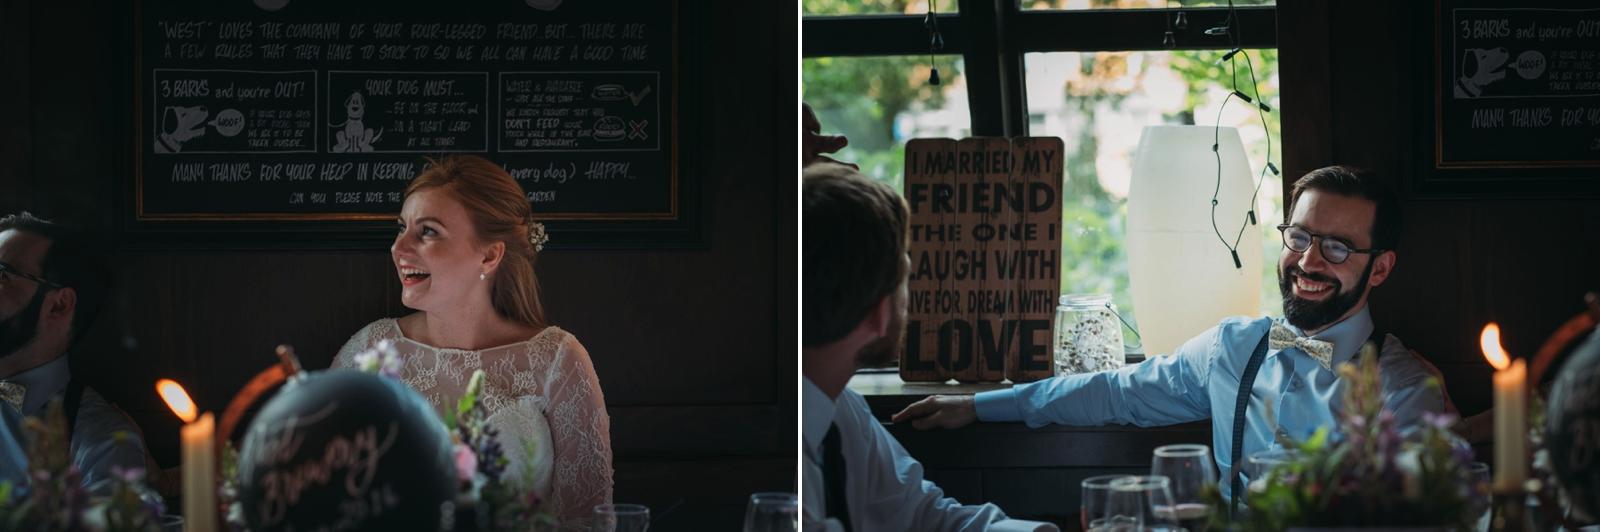 Gillian-Evan-West-Brewery-Jo-Donaldson-Photography-548.jpg